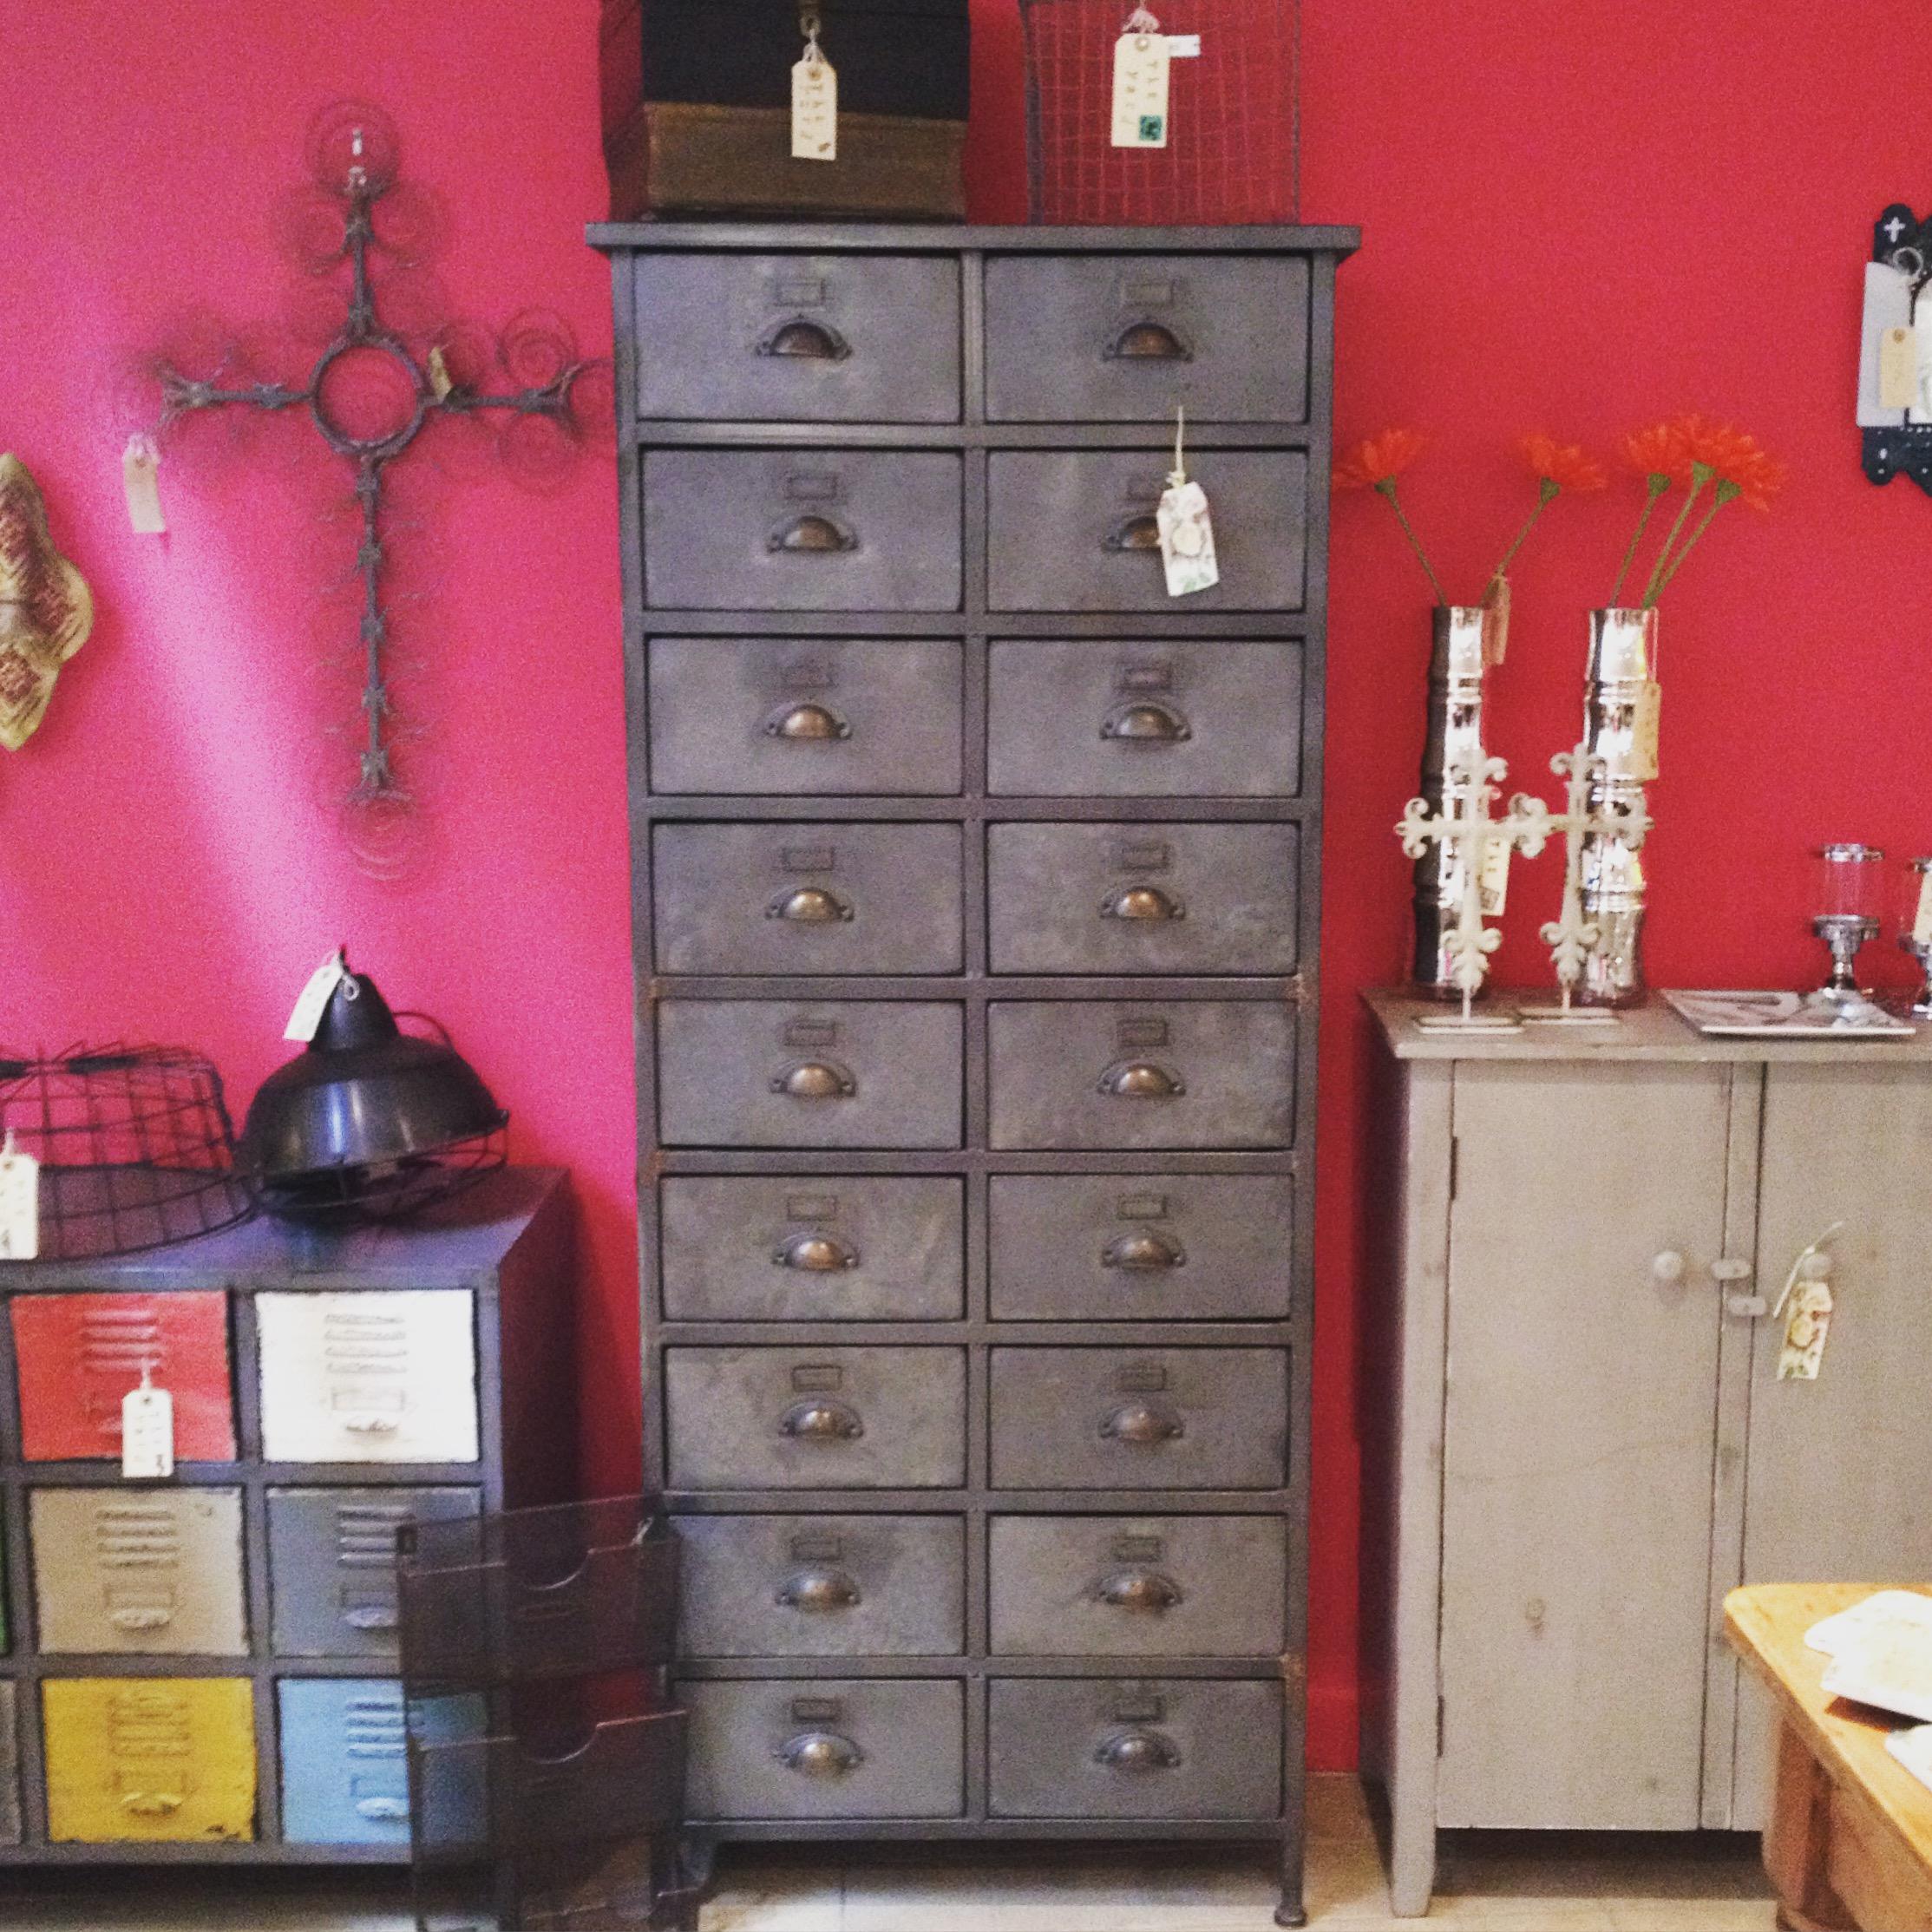 Tall metal drawers